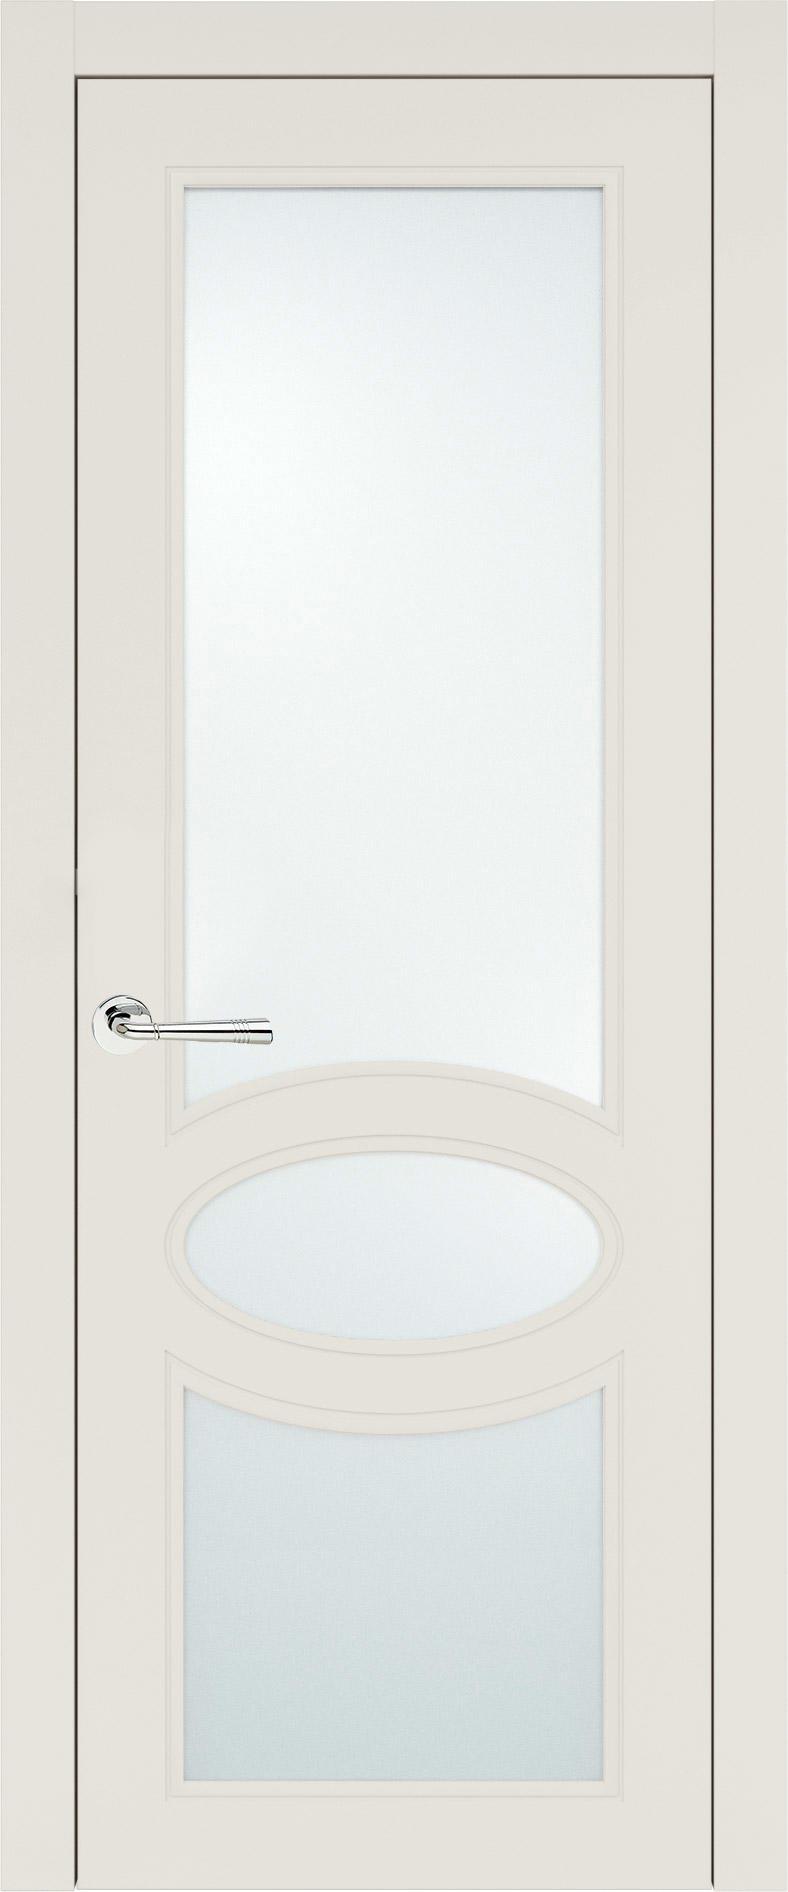 Florencia Neo Classic цвет - Бежевая эмаль (RAL 9010) Со стеклом (ДО)